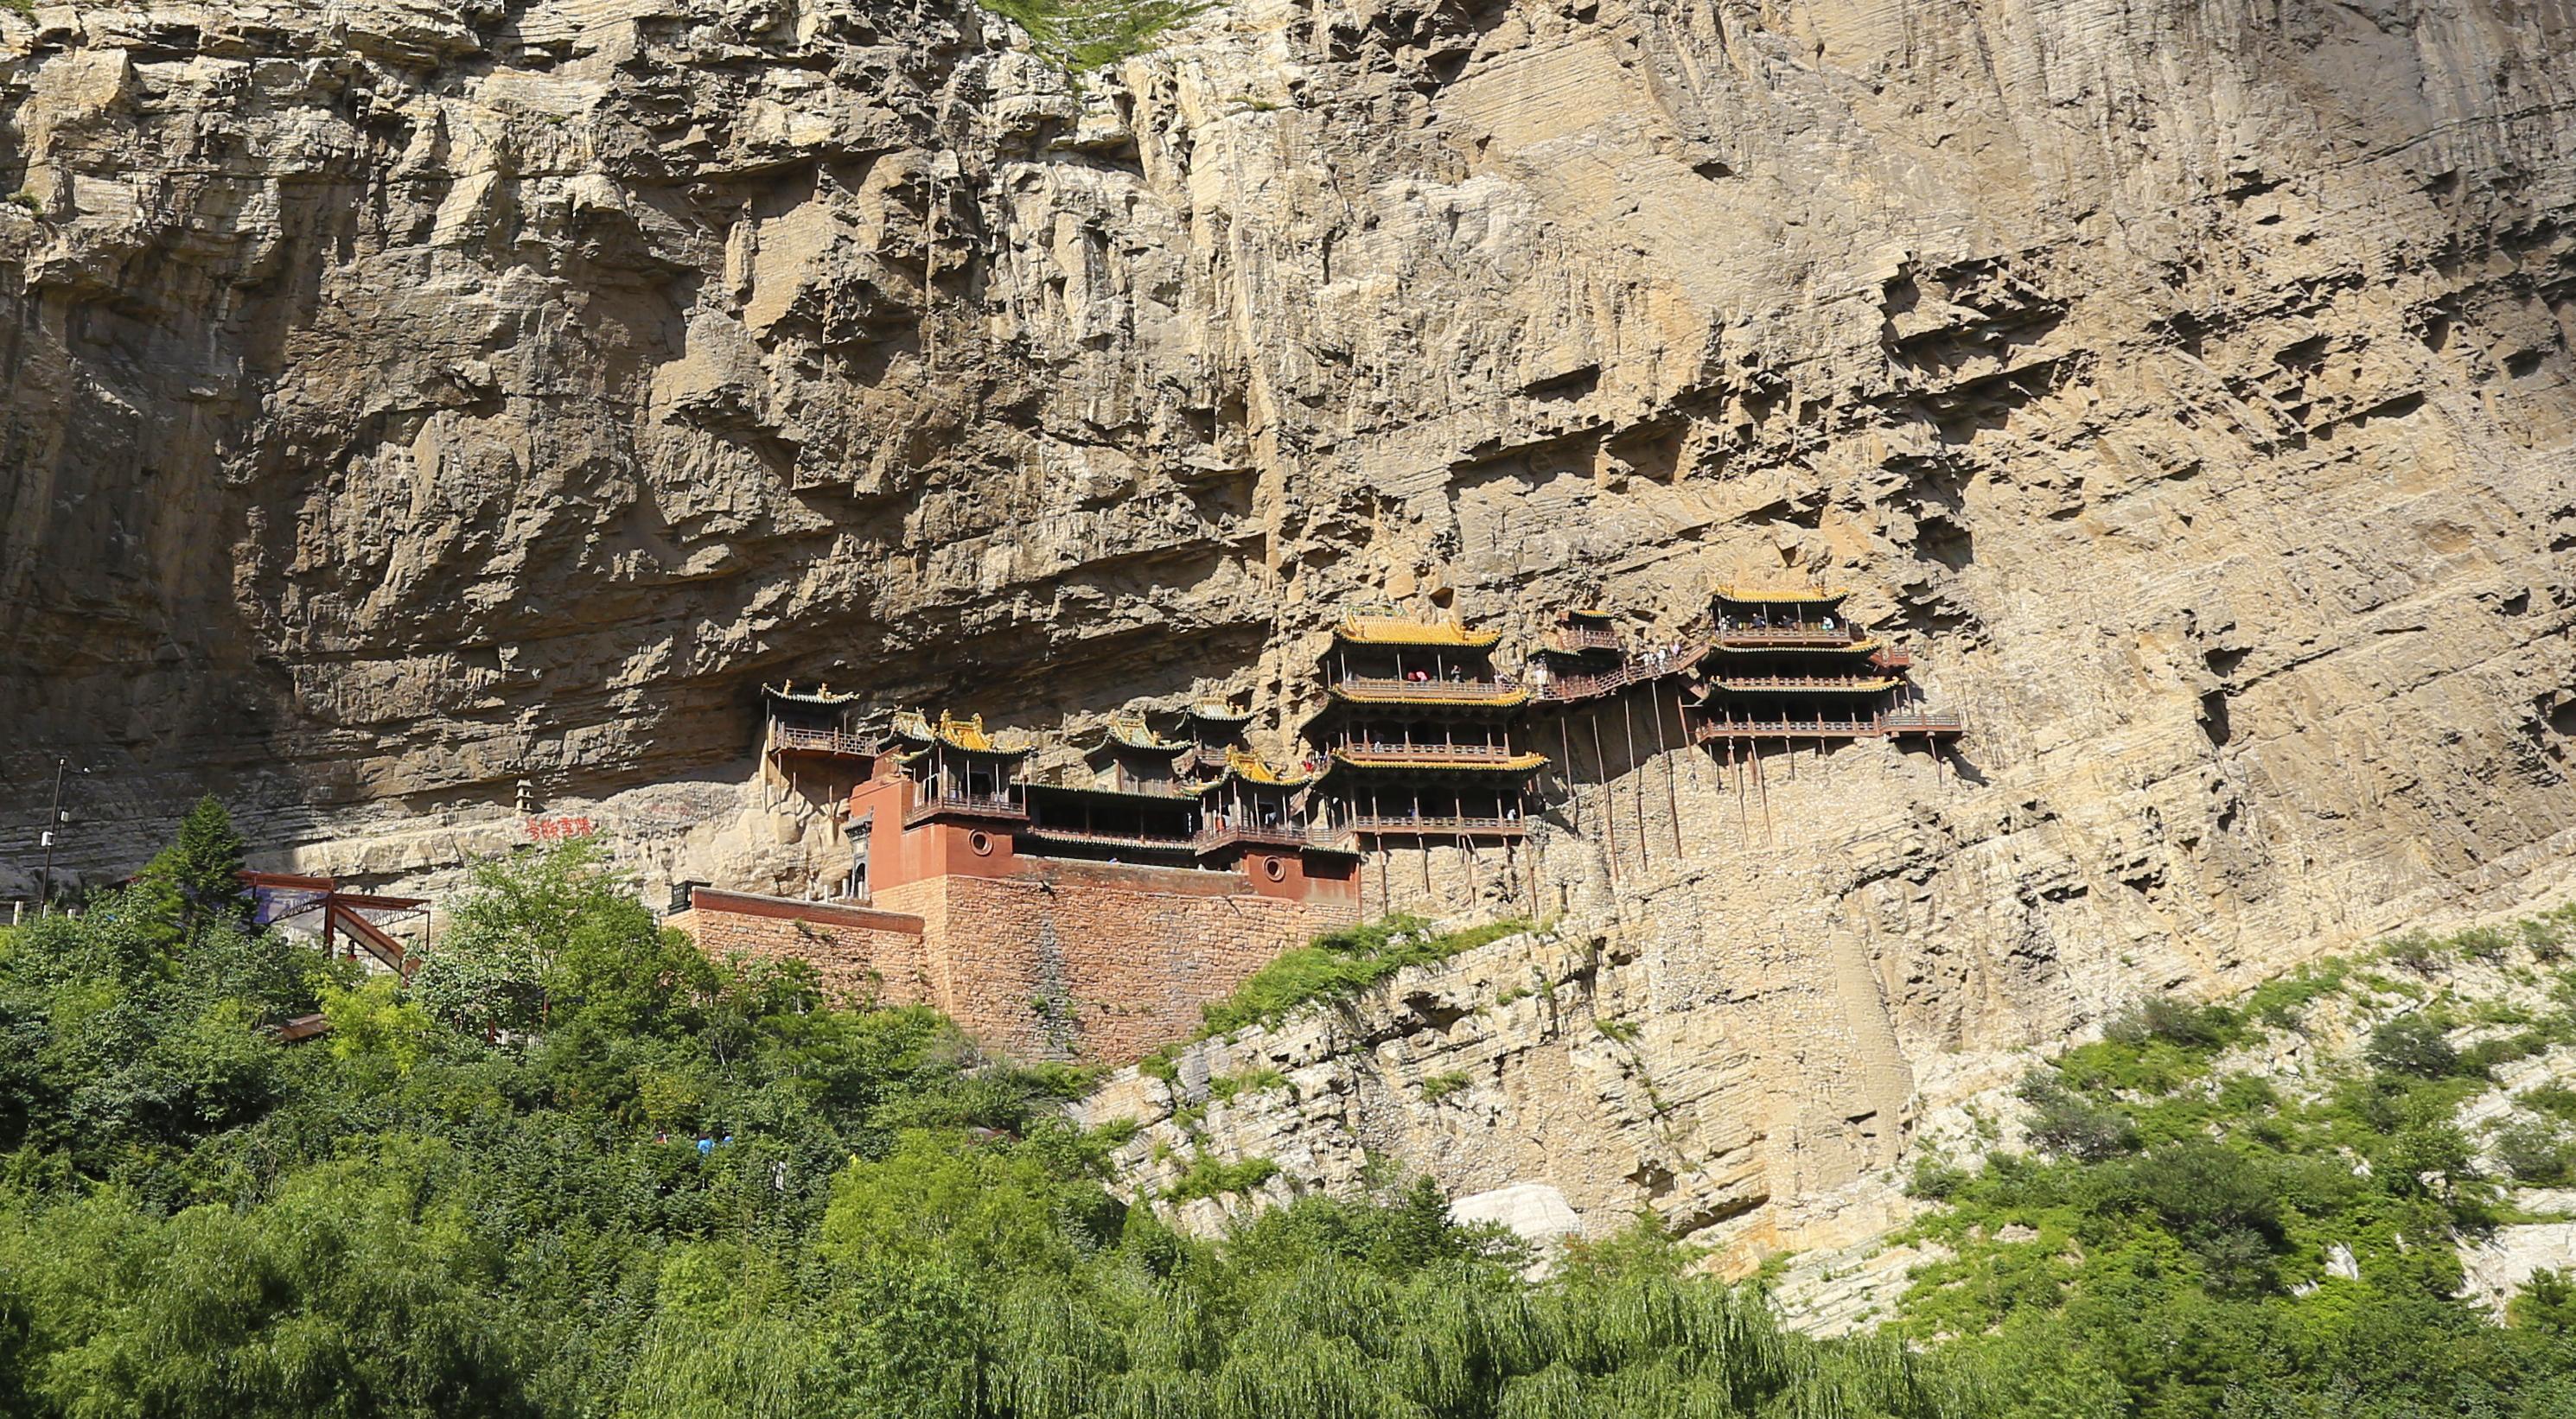 Templo milenar suspenso Hunyuan Xuankong, incrustado na rocha, na China